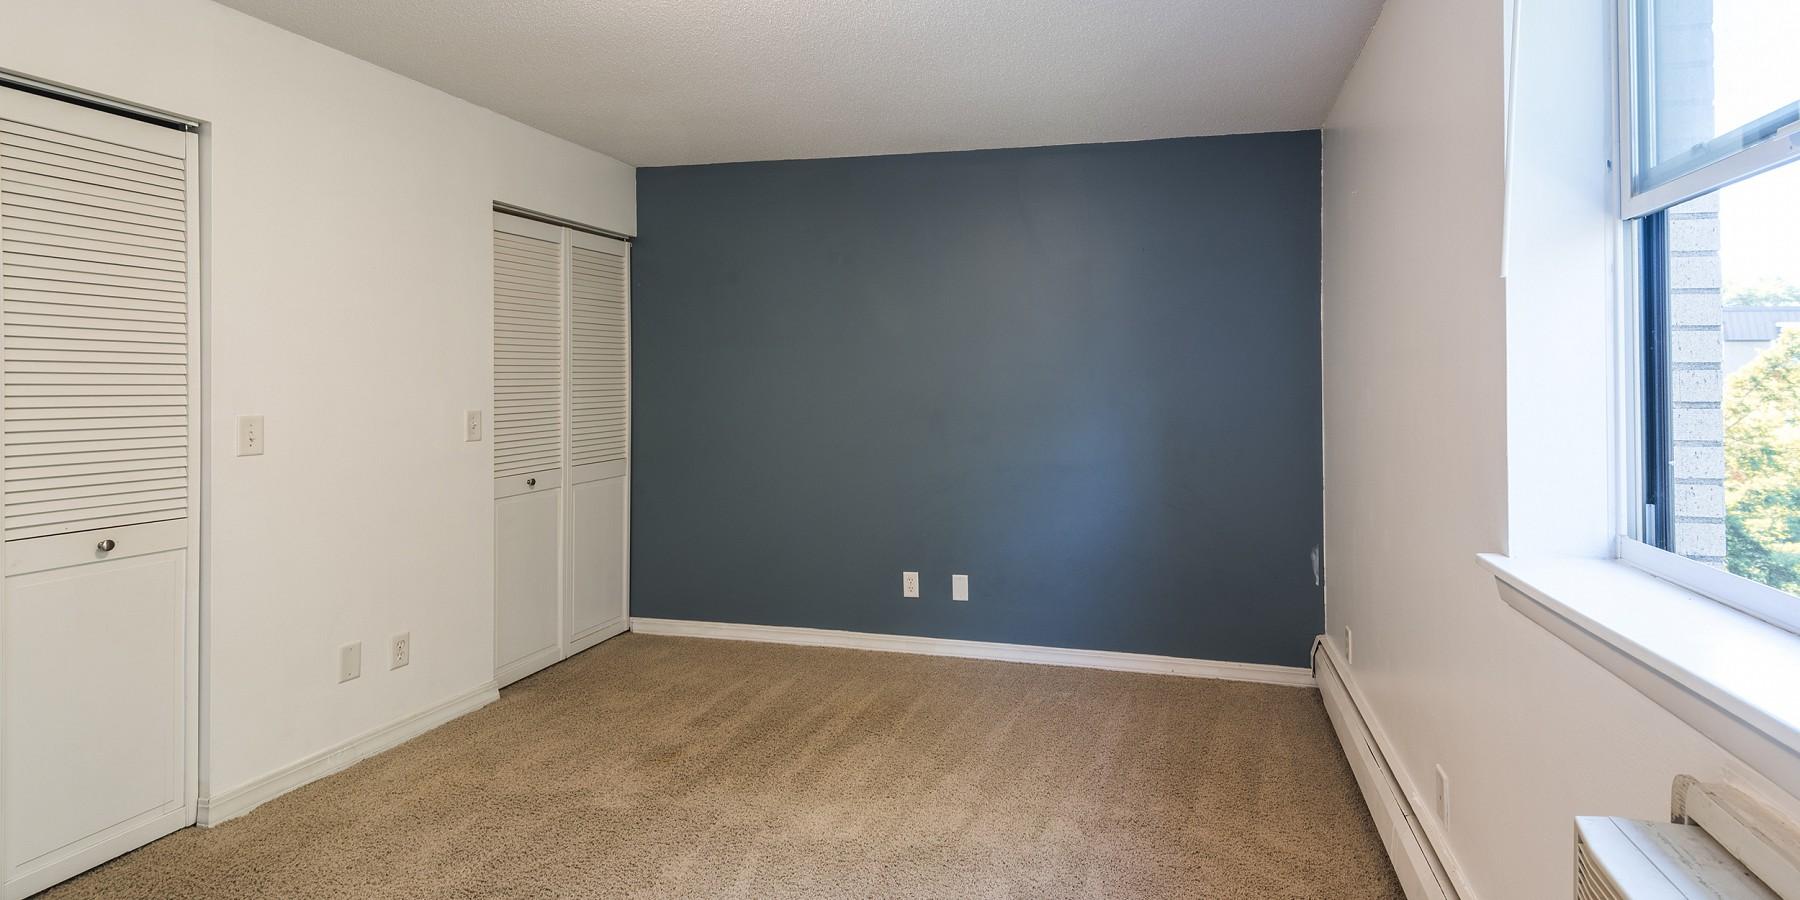 3150 EXCELSIOR BLVD #203, Minneapolis, MN 55416